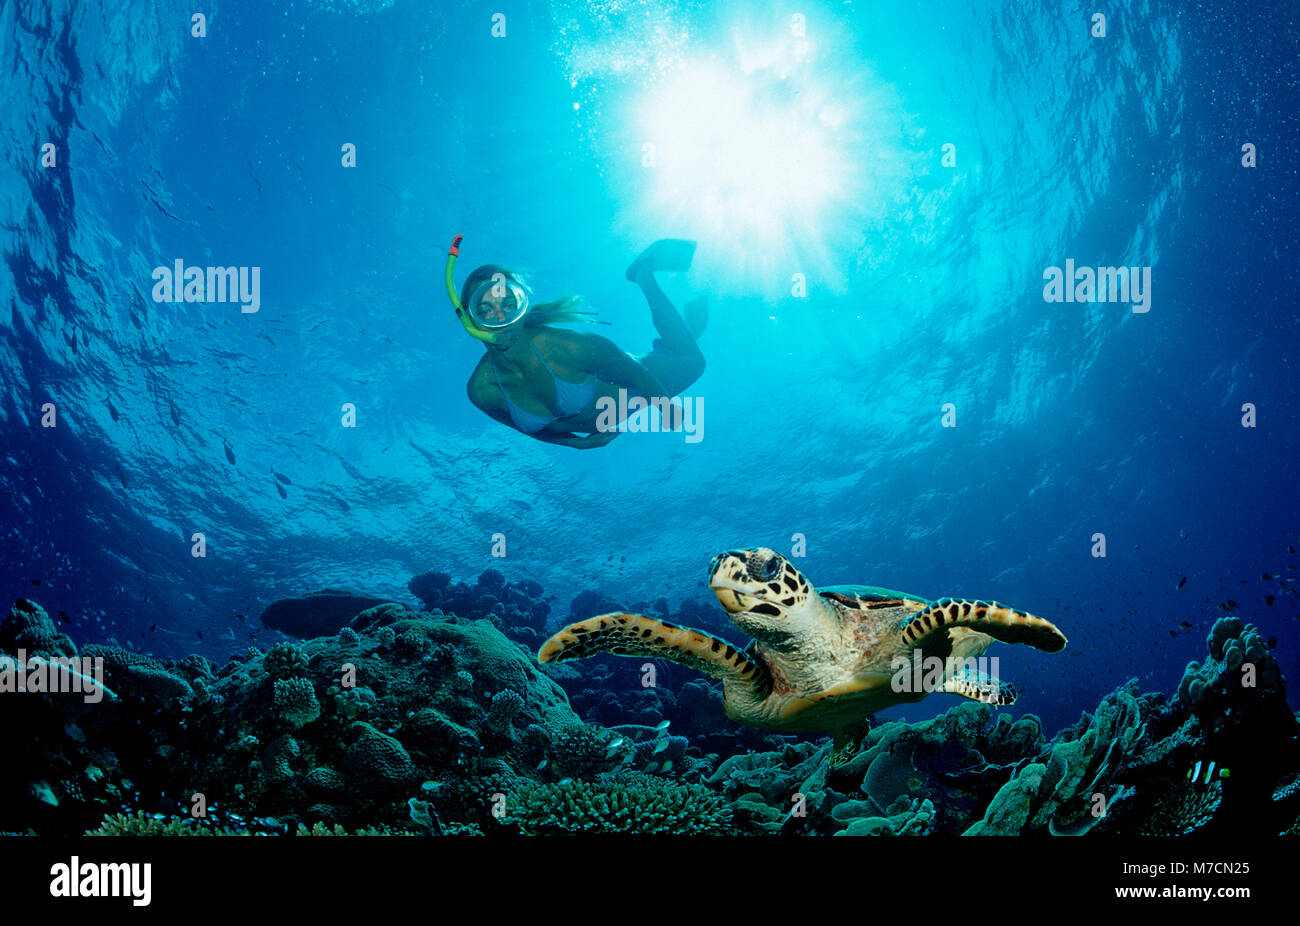 Hawksbill Schildkröte und Skin Diver, Eretmochelys imbricata, Malediven, Indischer Ozean, Meemu Atoll Stockbild